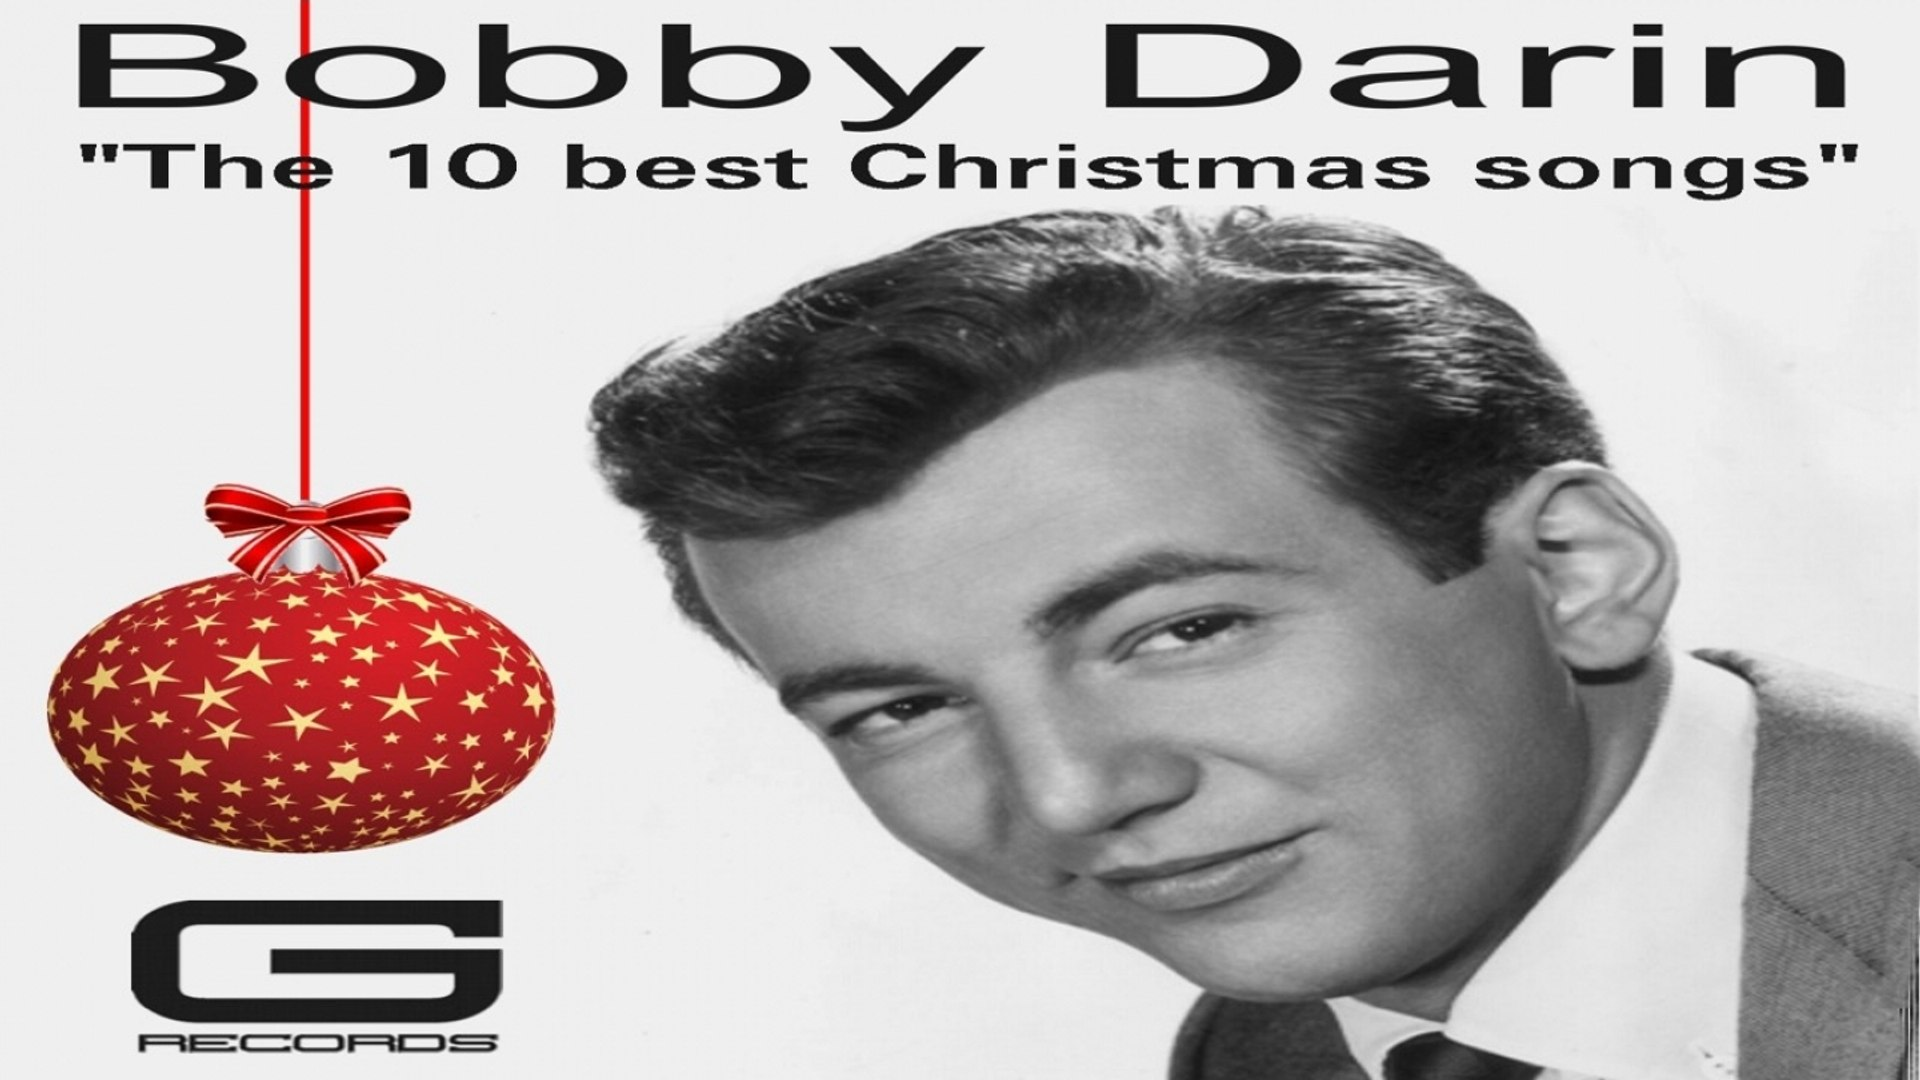 Bobby Darin - Silent night holy night